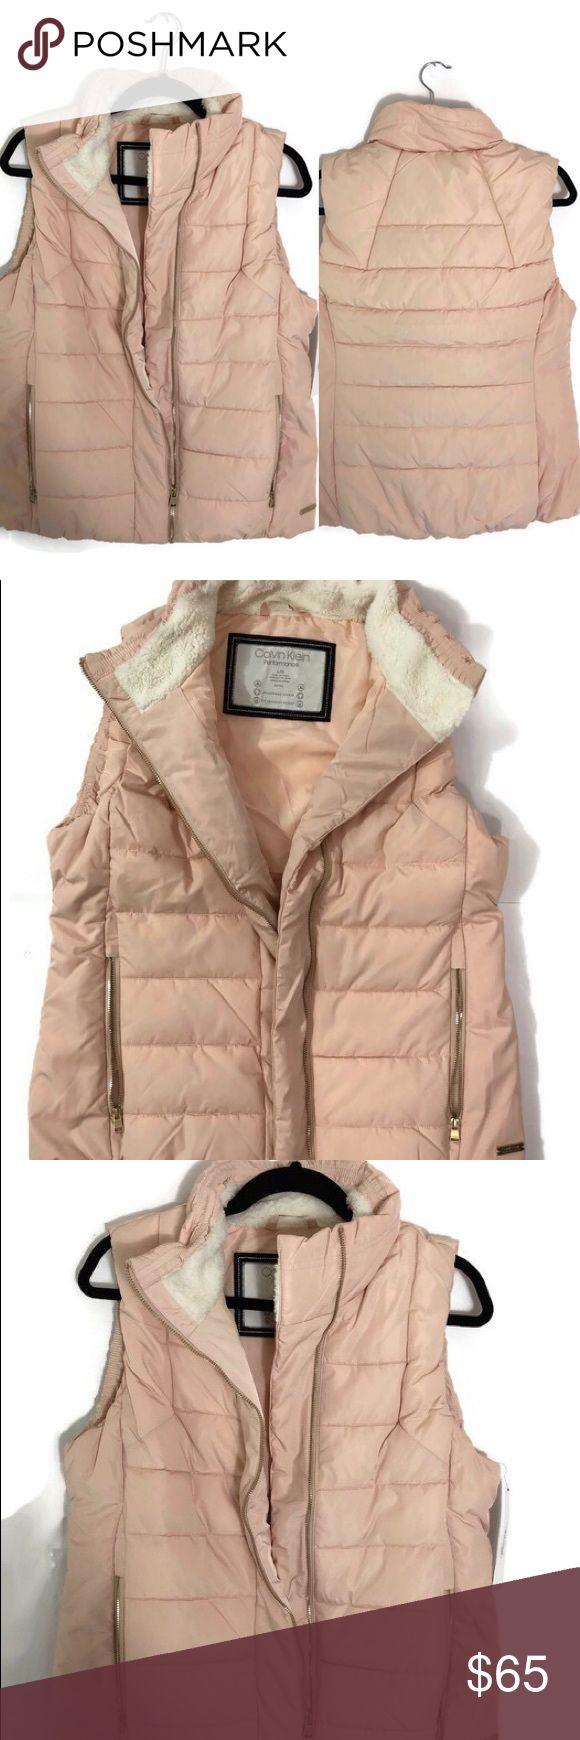 Calvin Klein Women S Large Pink Performance Vest Clothes Design Fashion Fashion Design [ 1740 x 580 Pixel ]